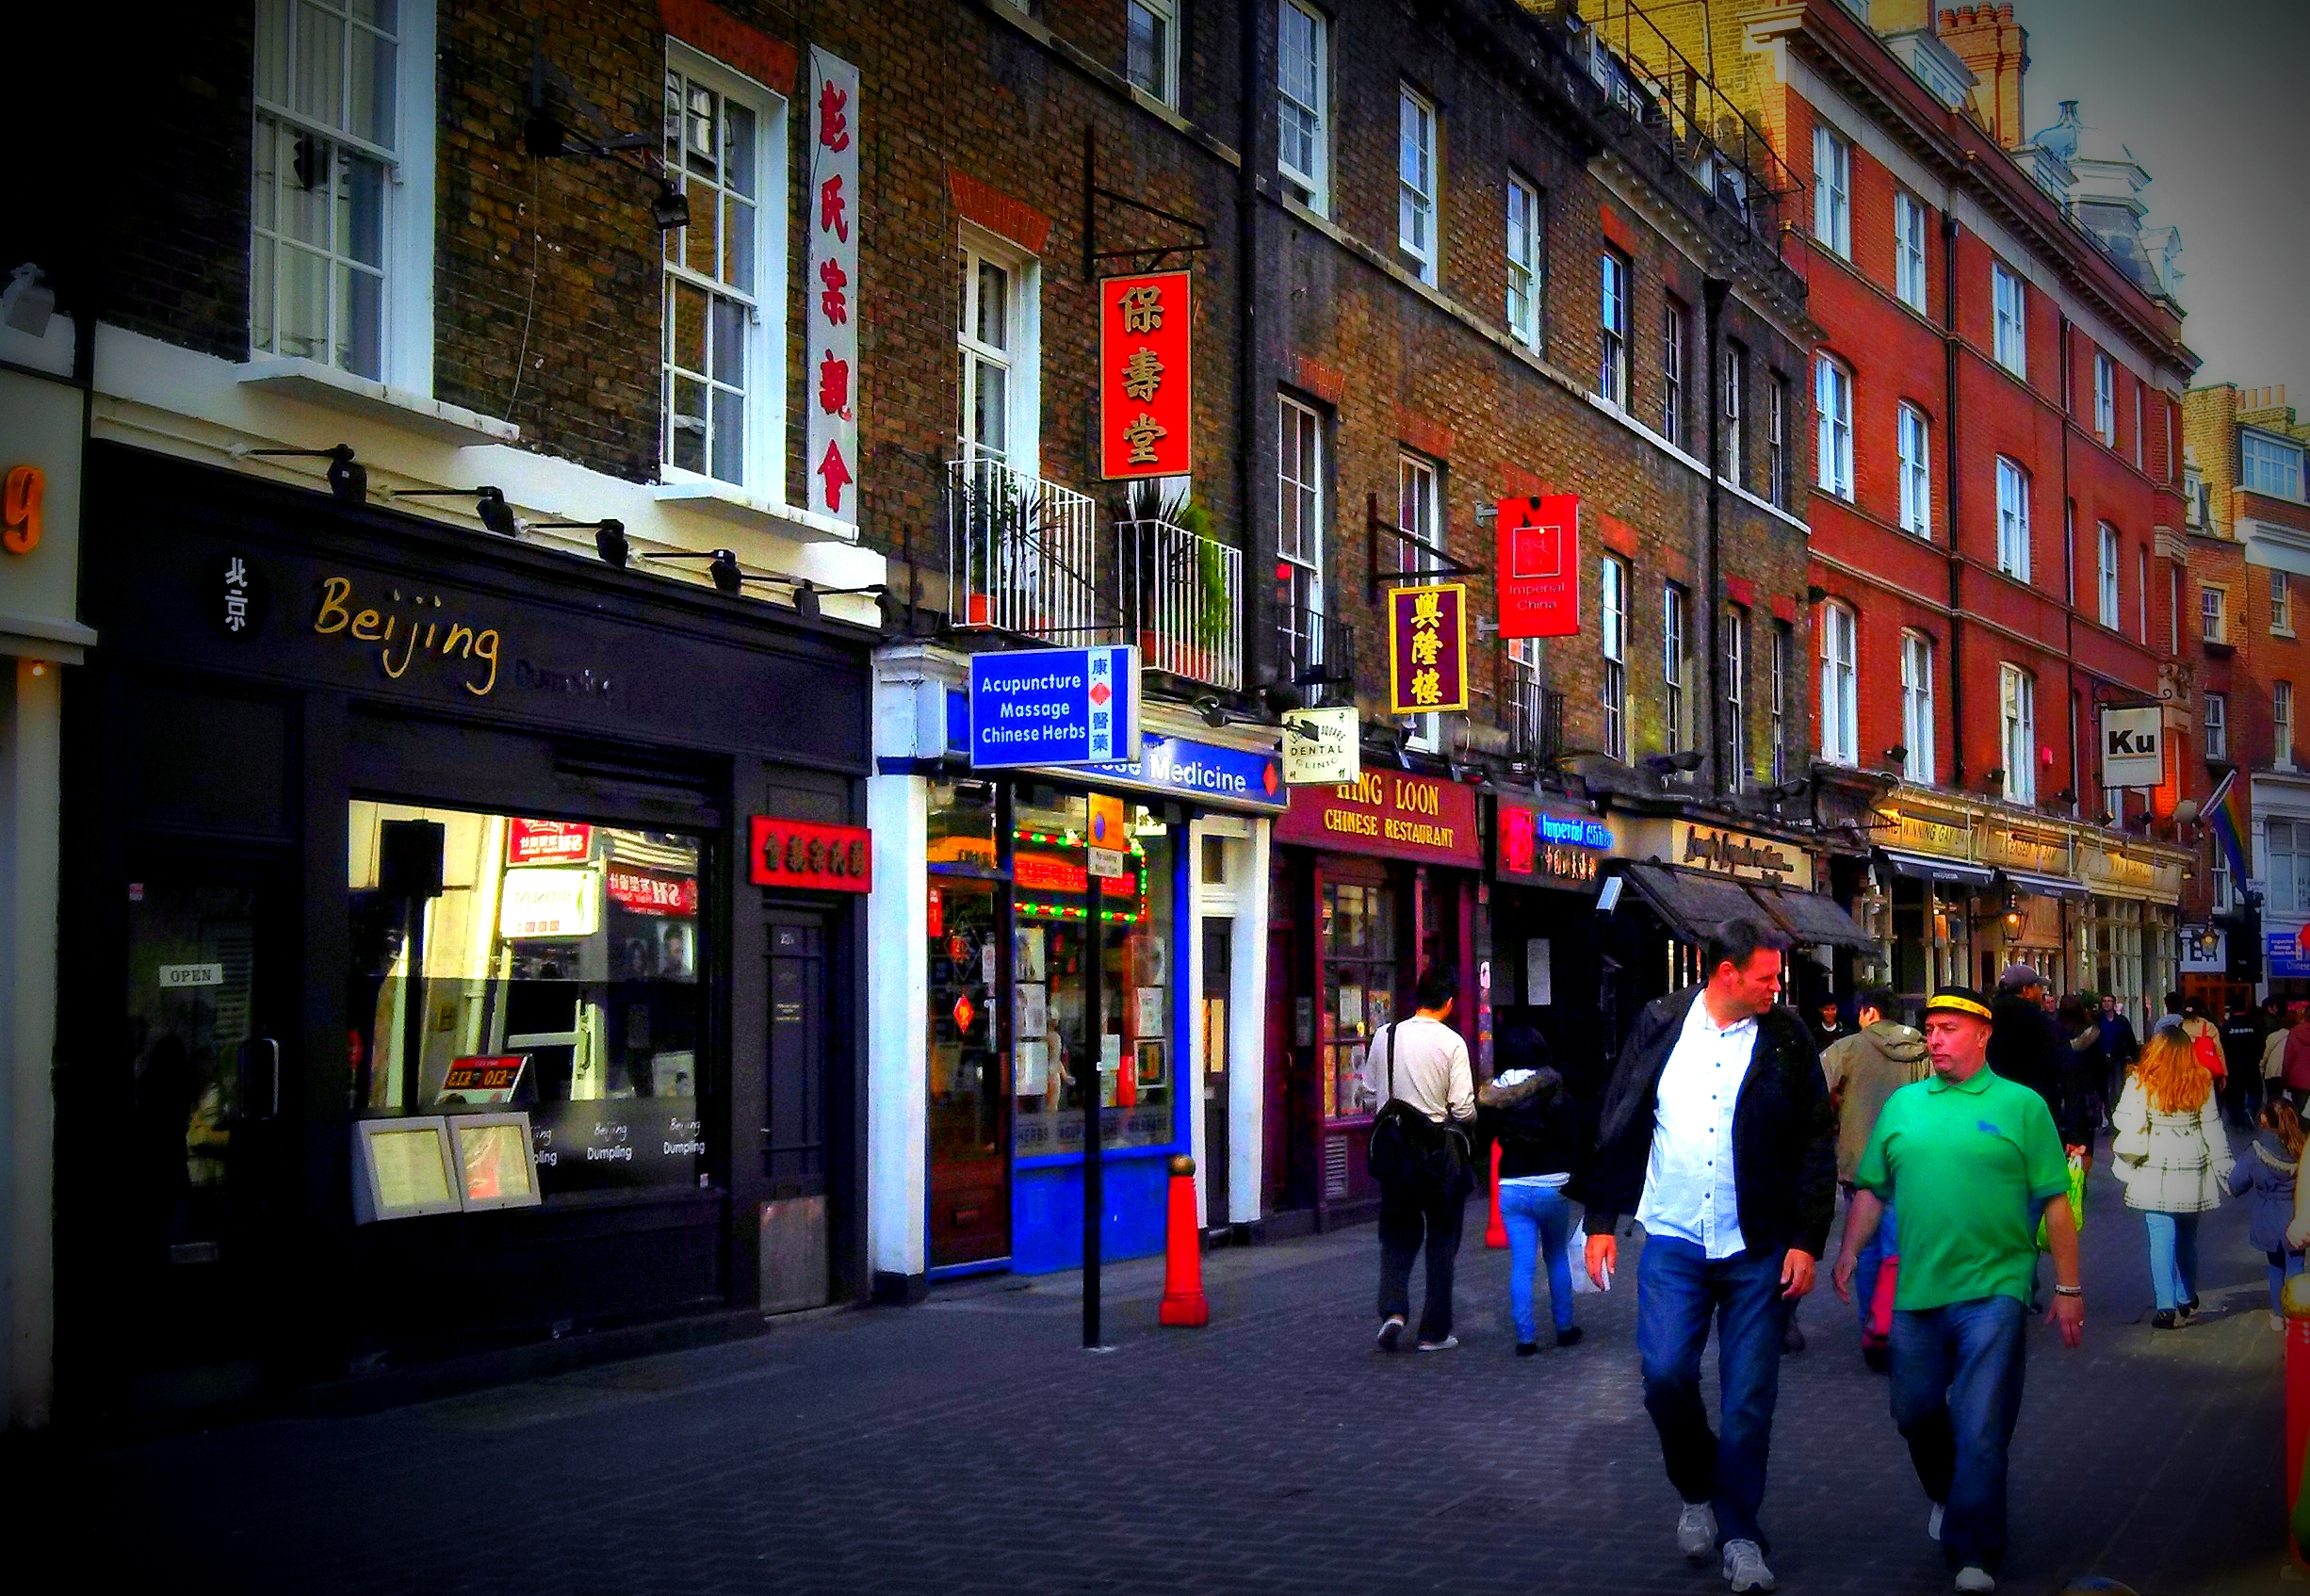 london street scenes china town